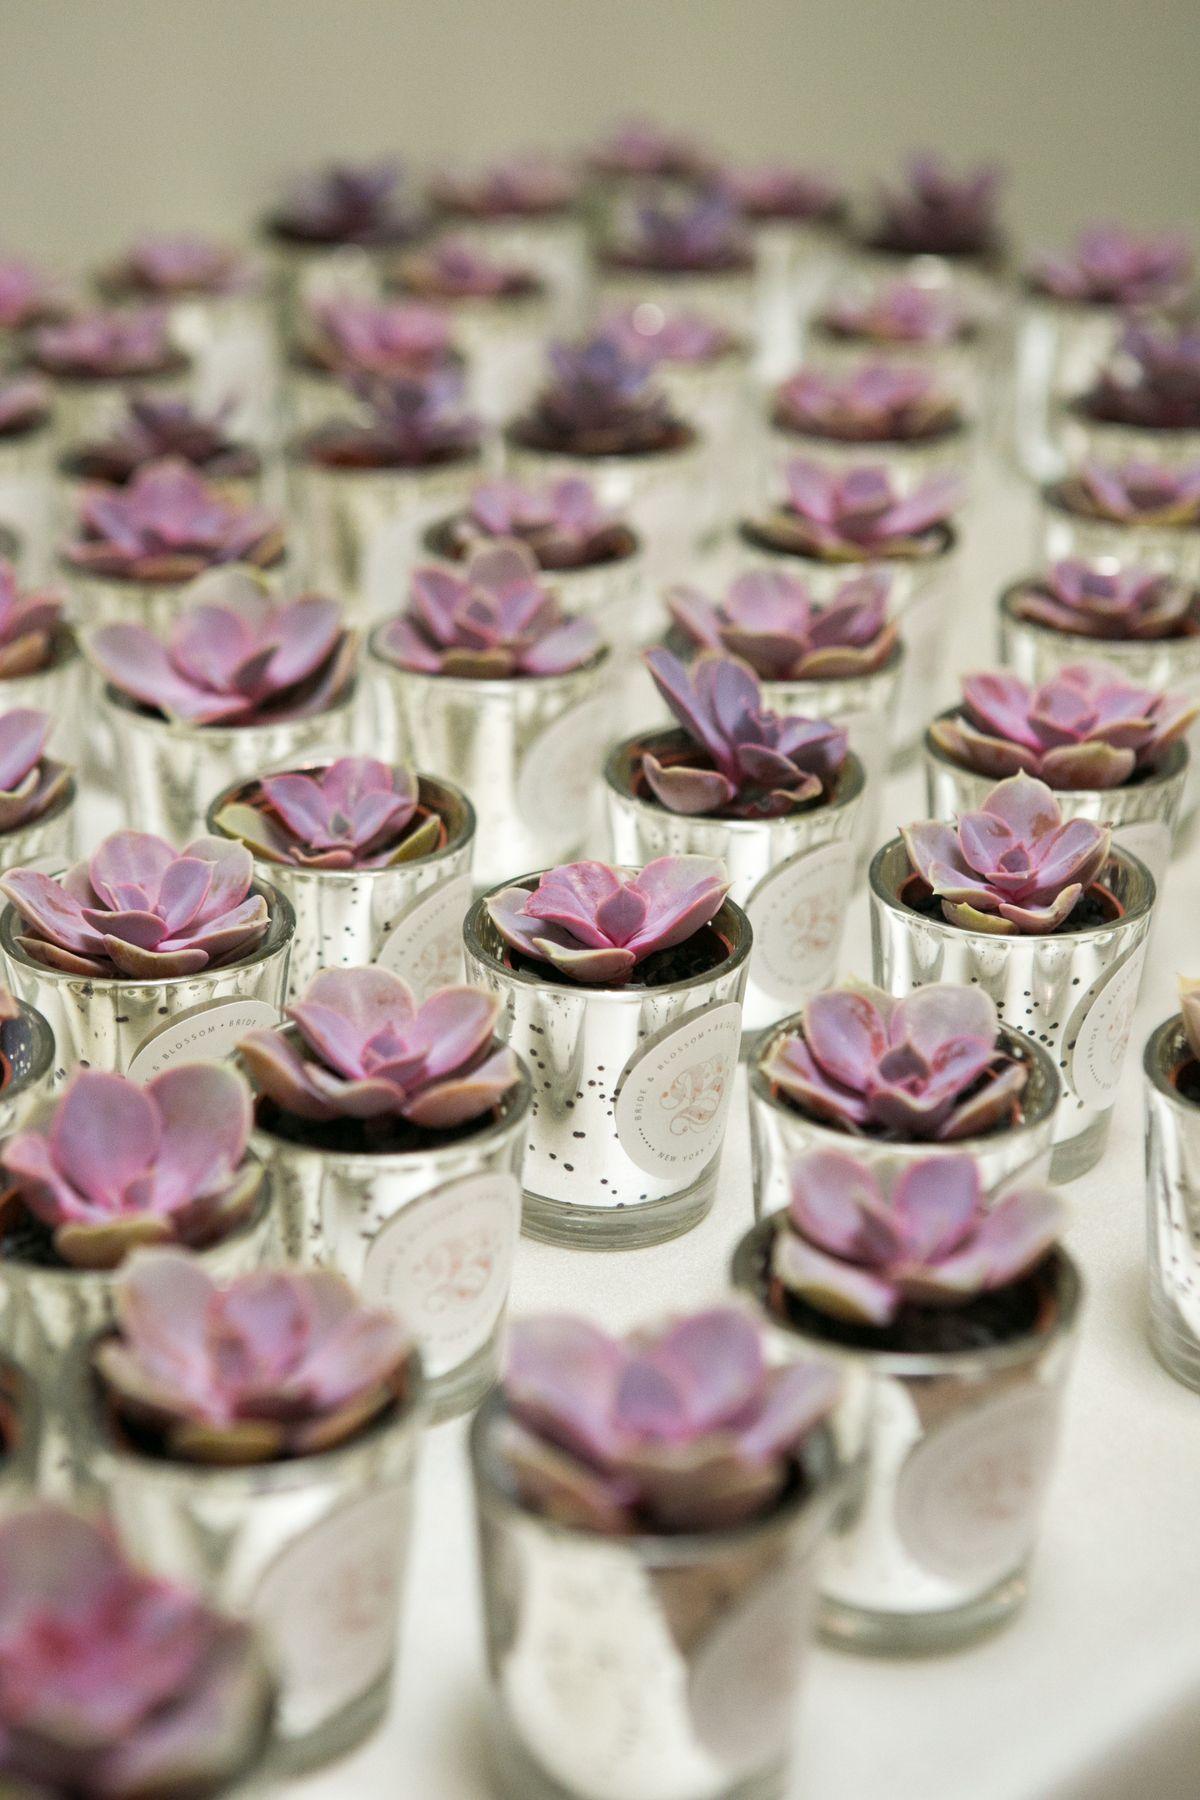 We Love Mini Succulent Party Favors By Bride Amp Blossom